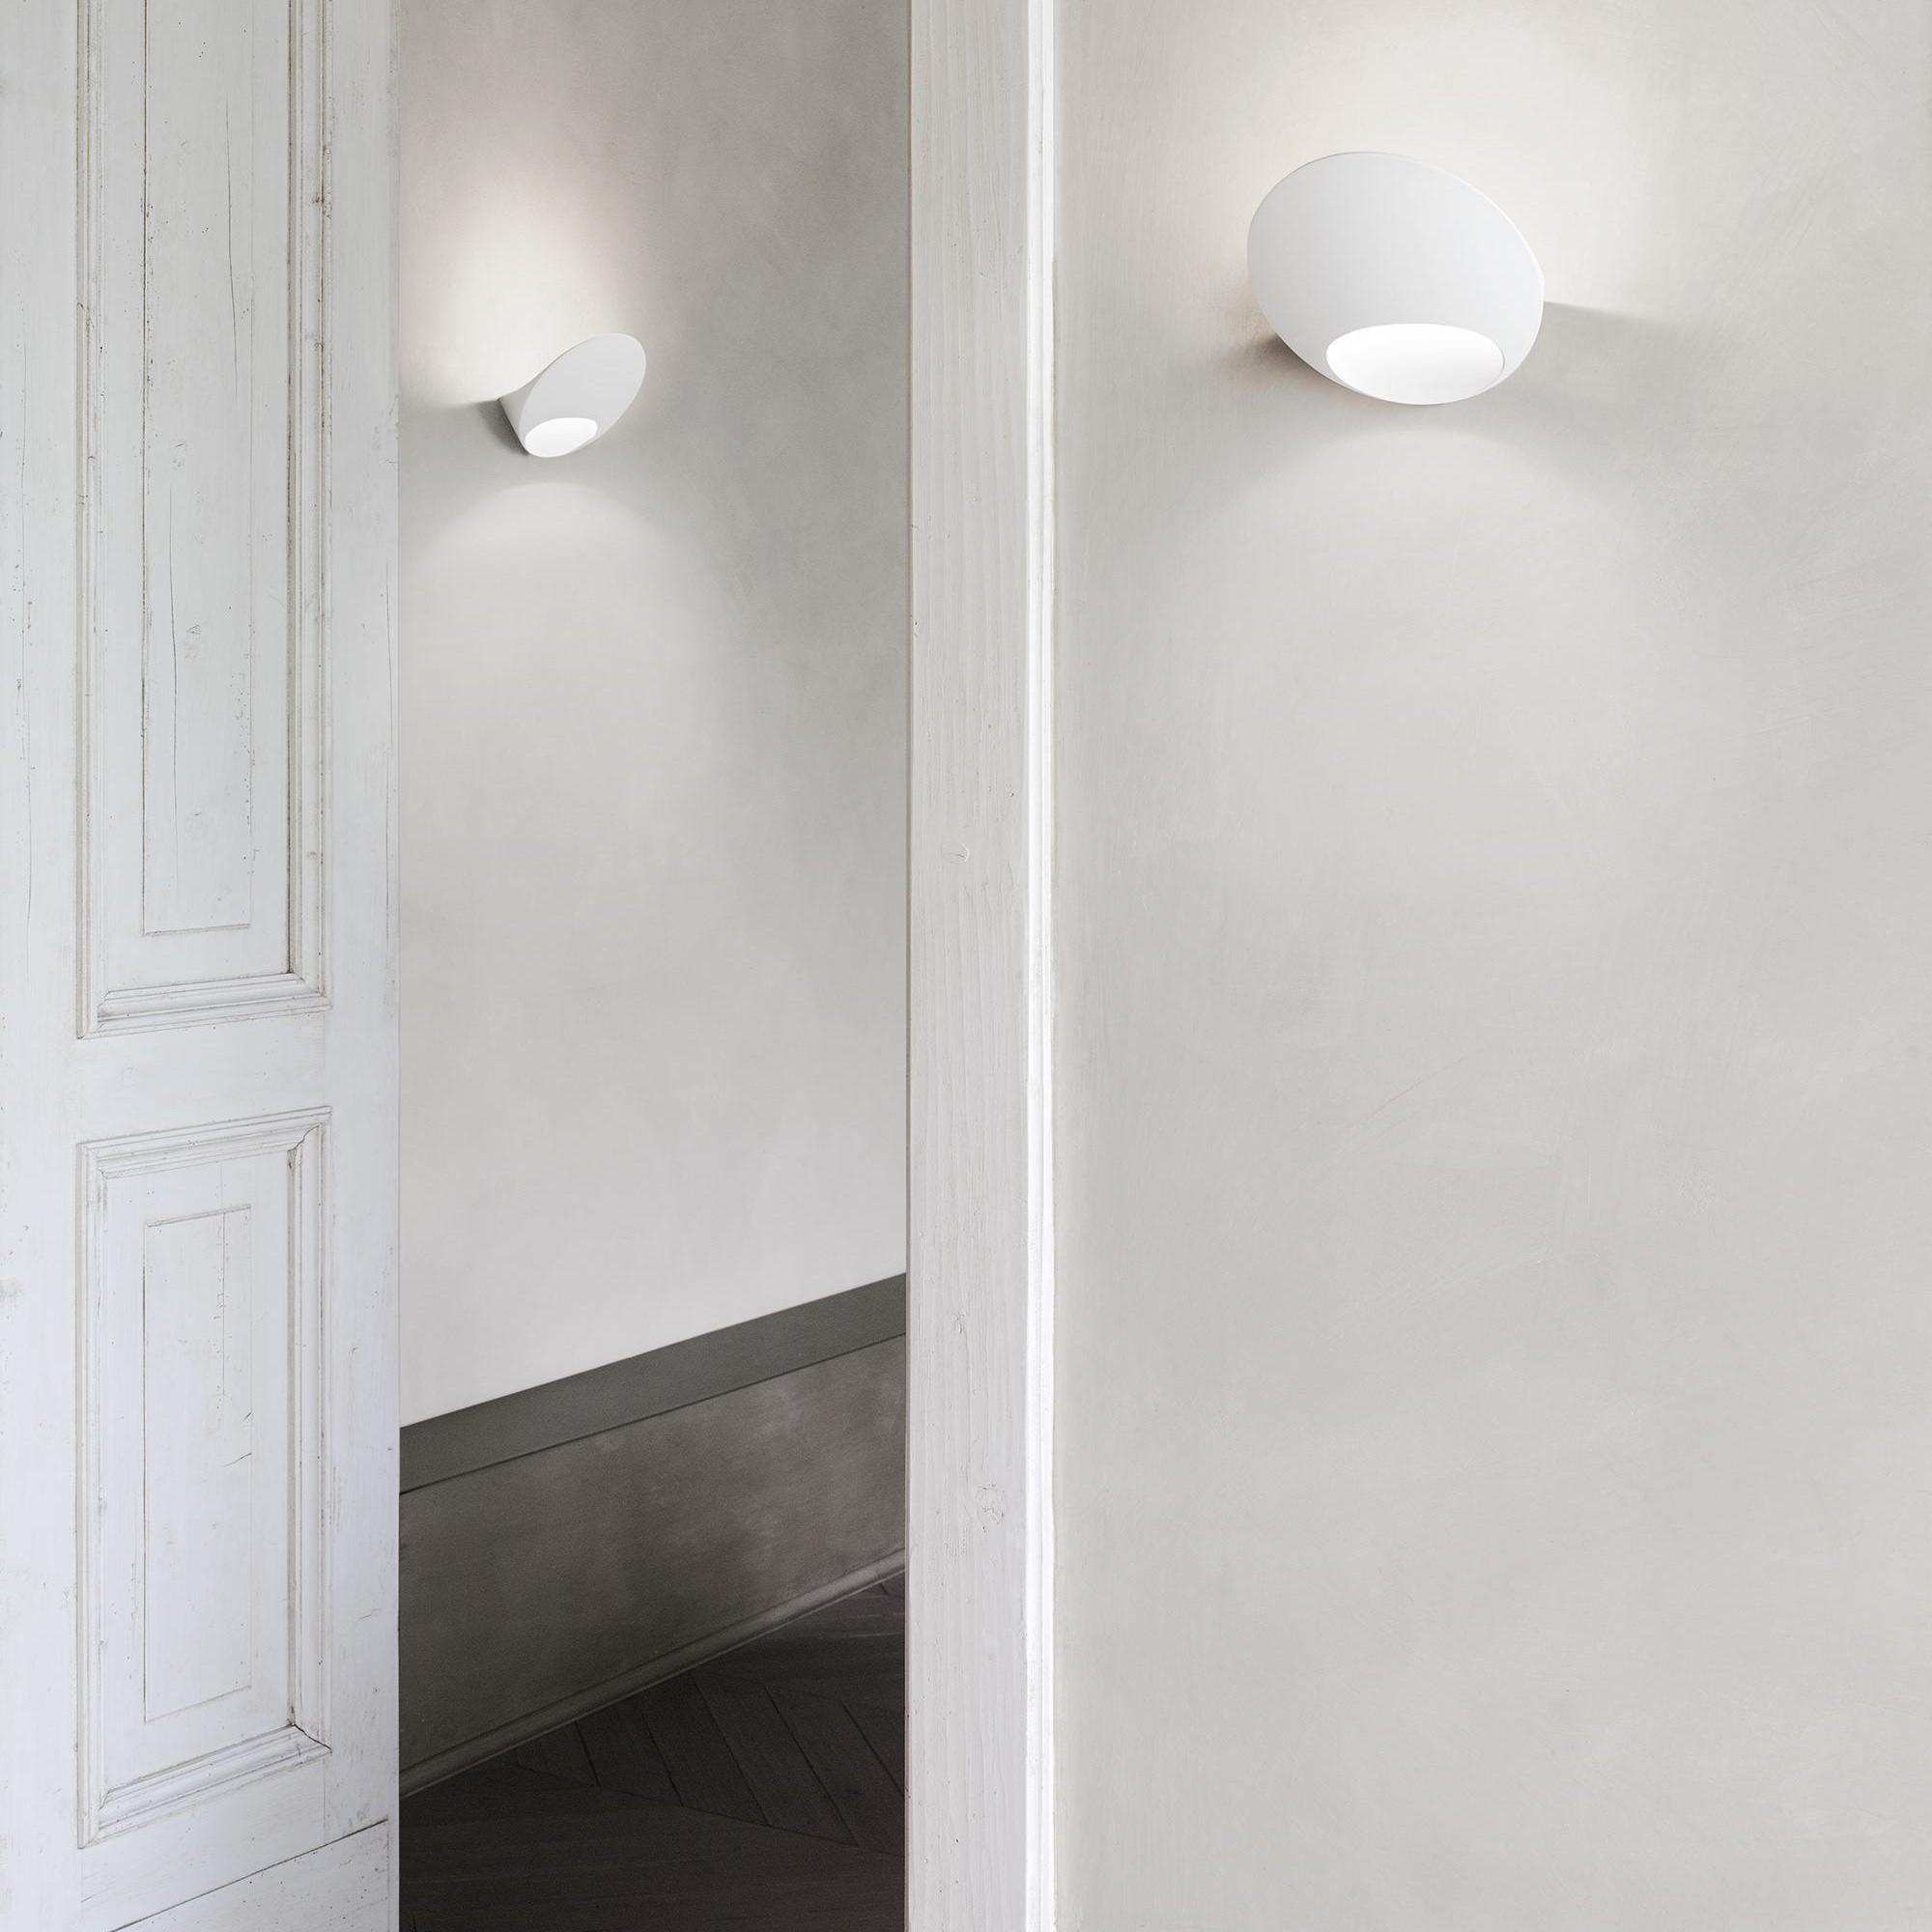 Full Size of Luceplan Garb Led Wandleuchte Ambientedirect Wandleuchten Bad Badezimmer Schlafzimmer Wohnzimmer Wandleuchte Dimmbar